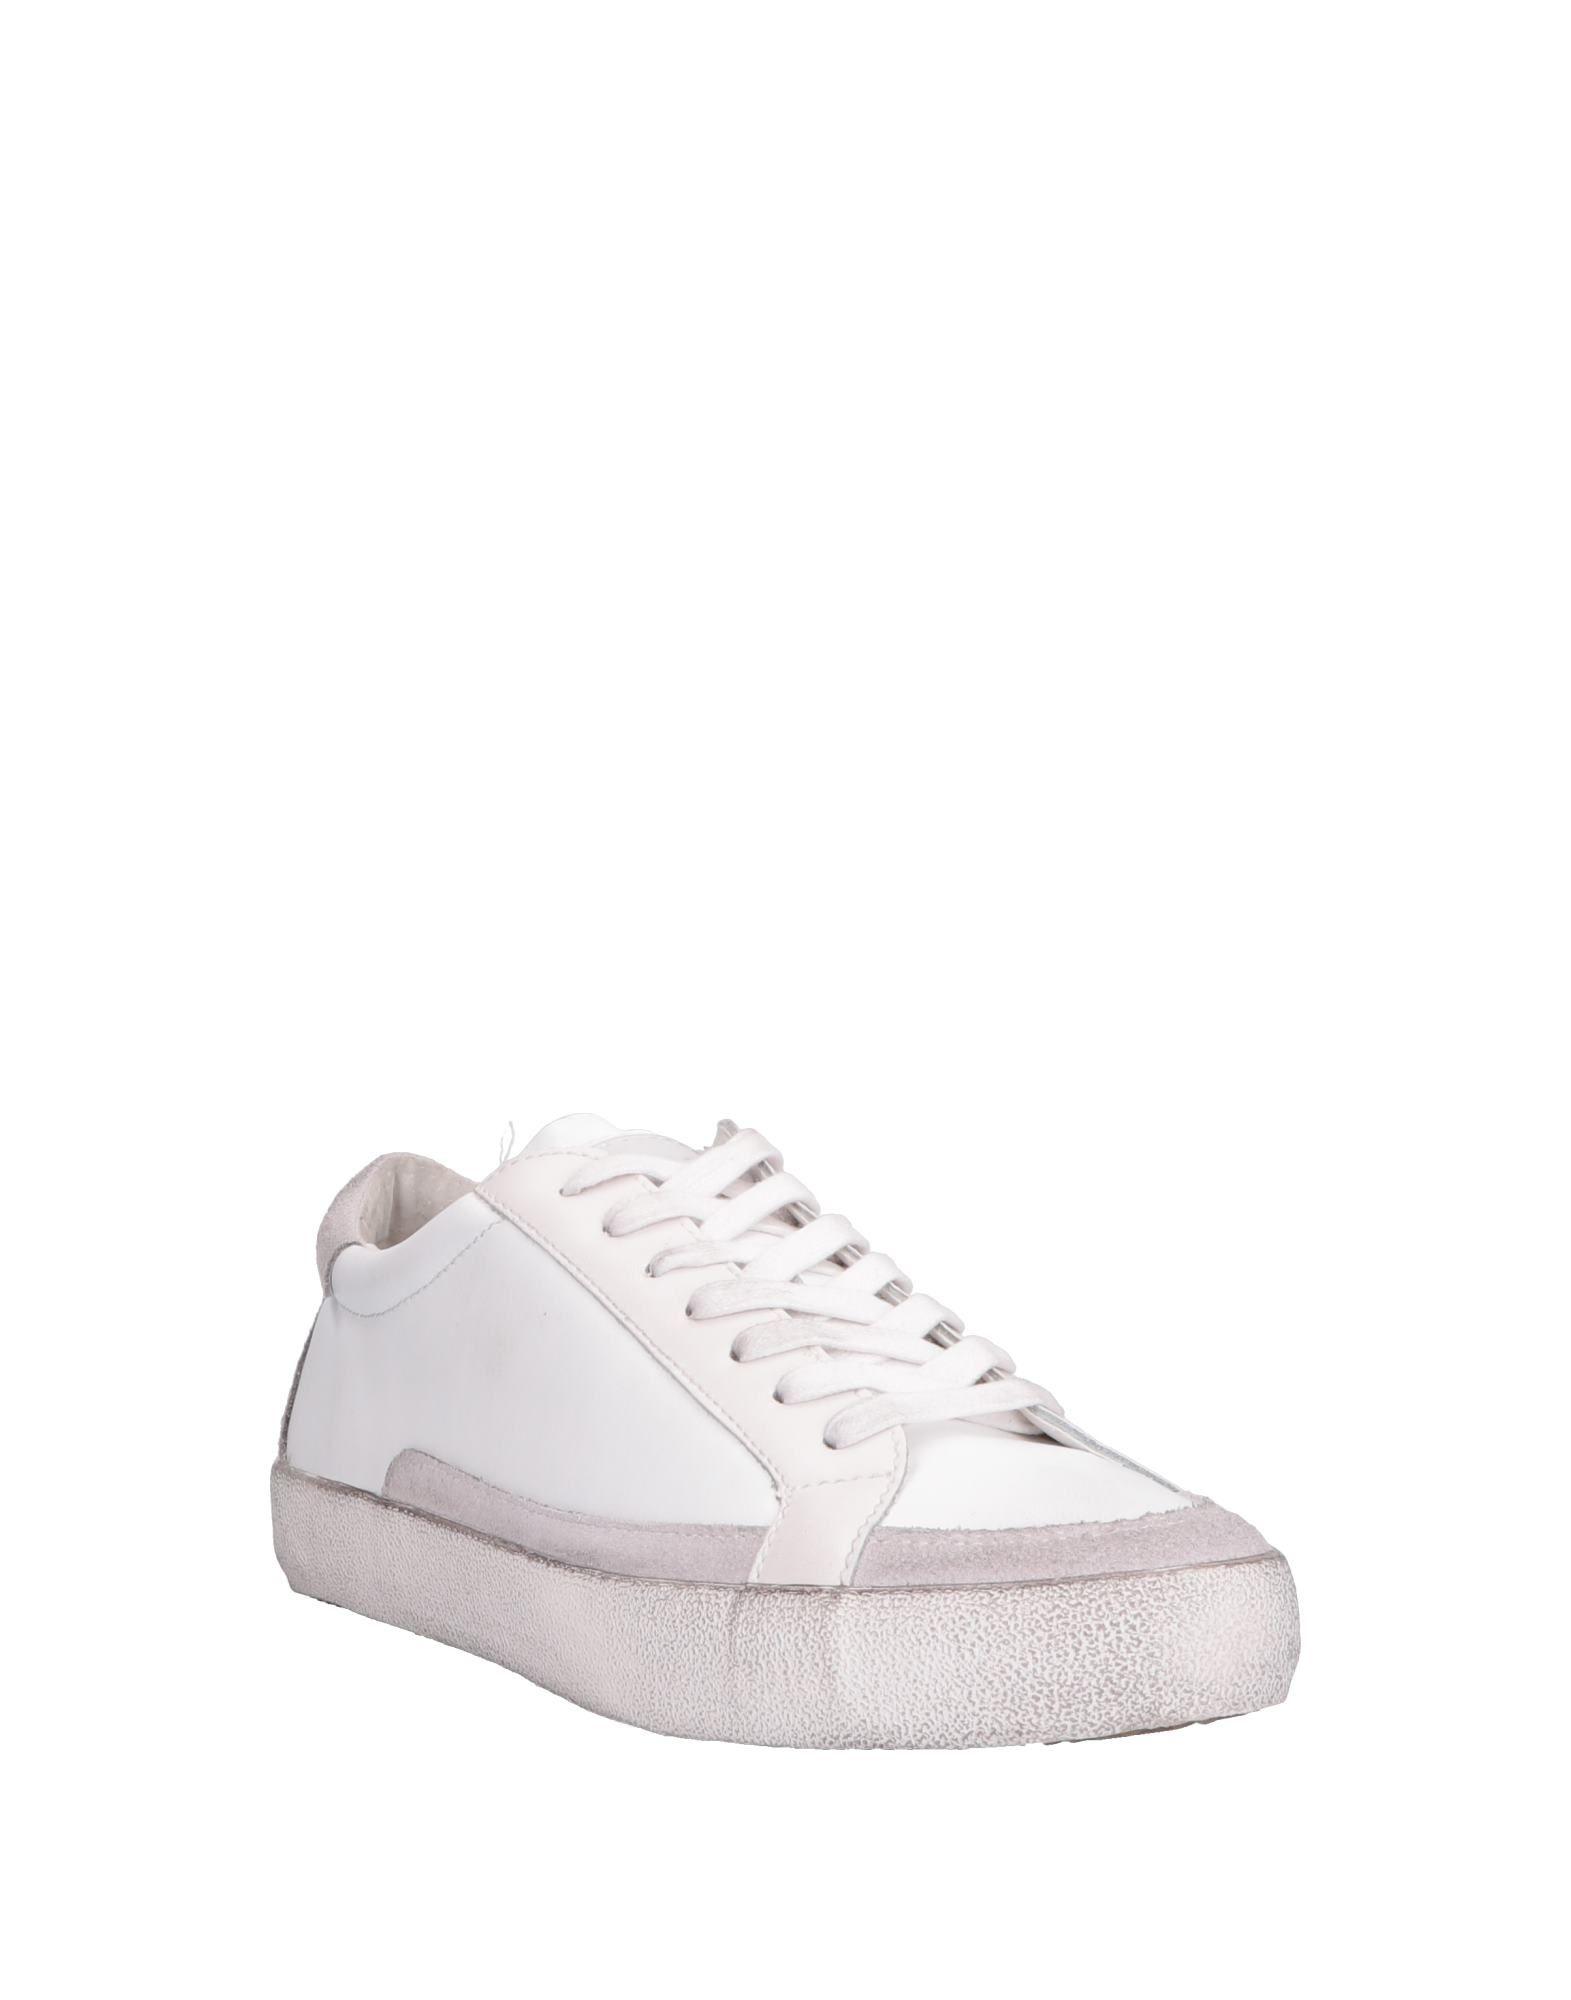 Rabatt echte Schuhe Religion Sneakers 11564383WO Herren  11564383WO Sneakers 62e7c1